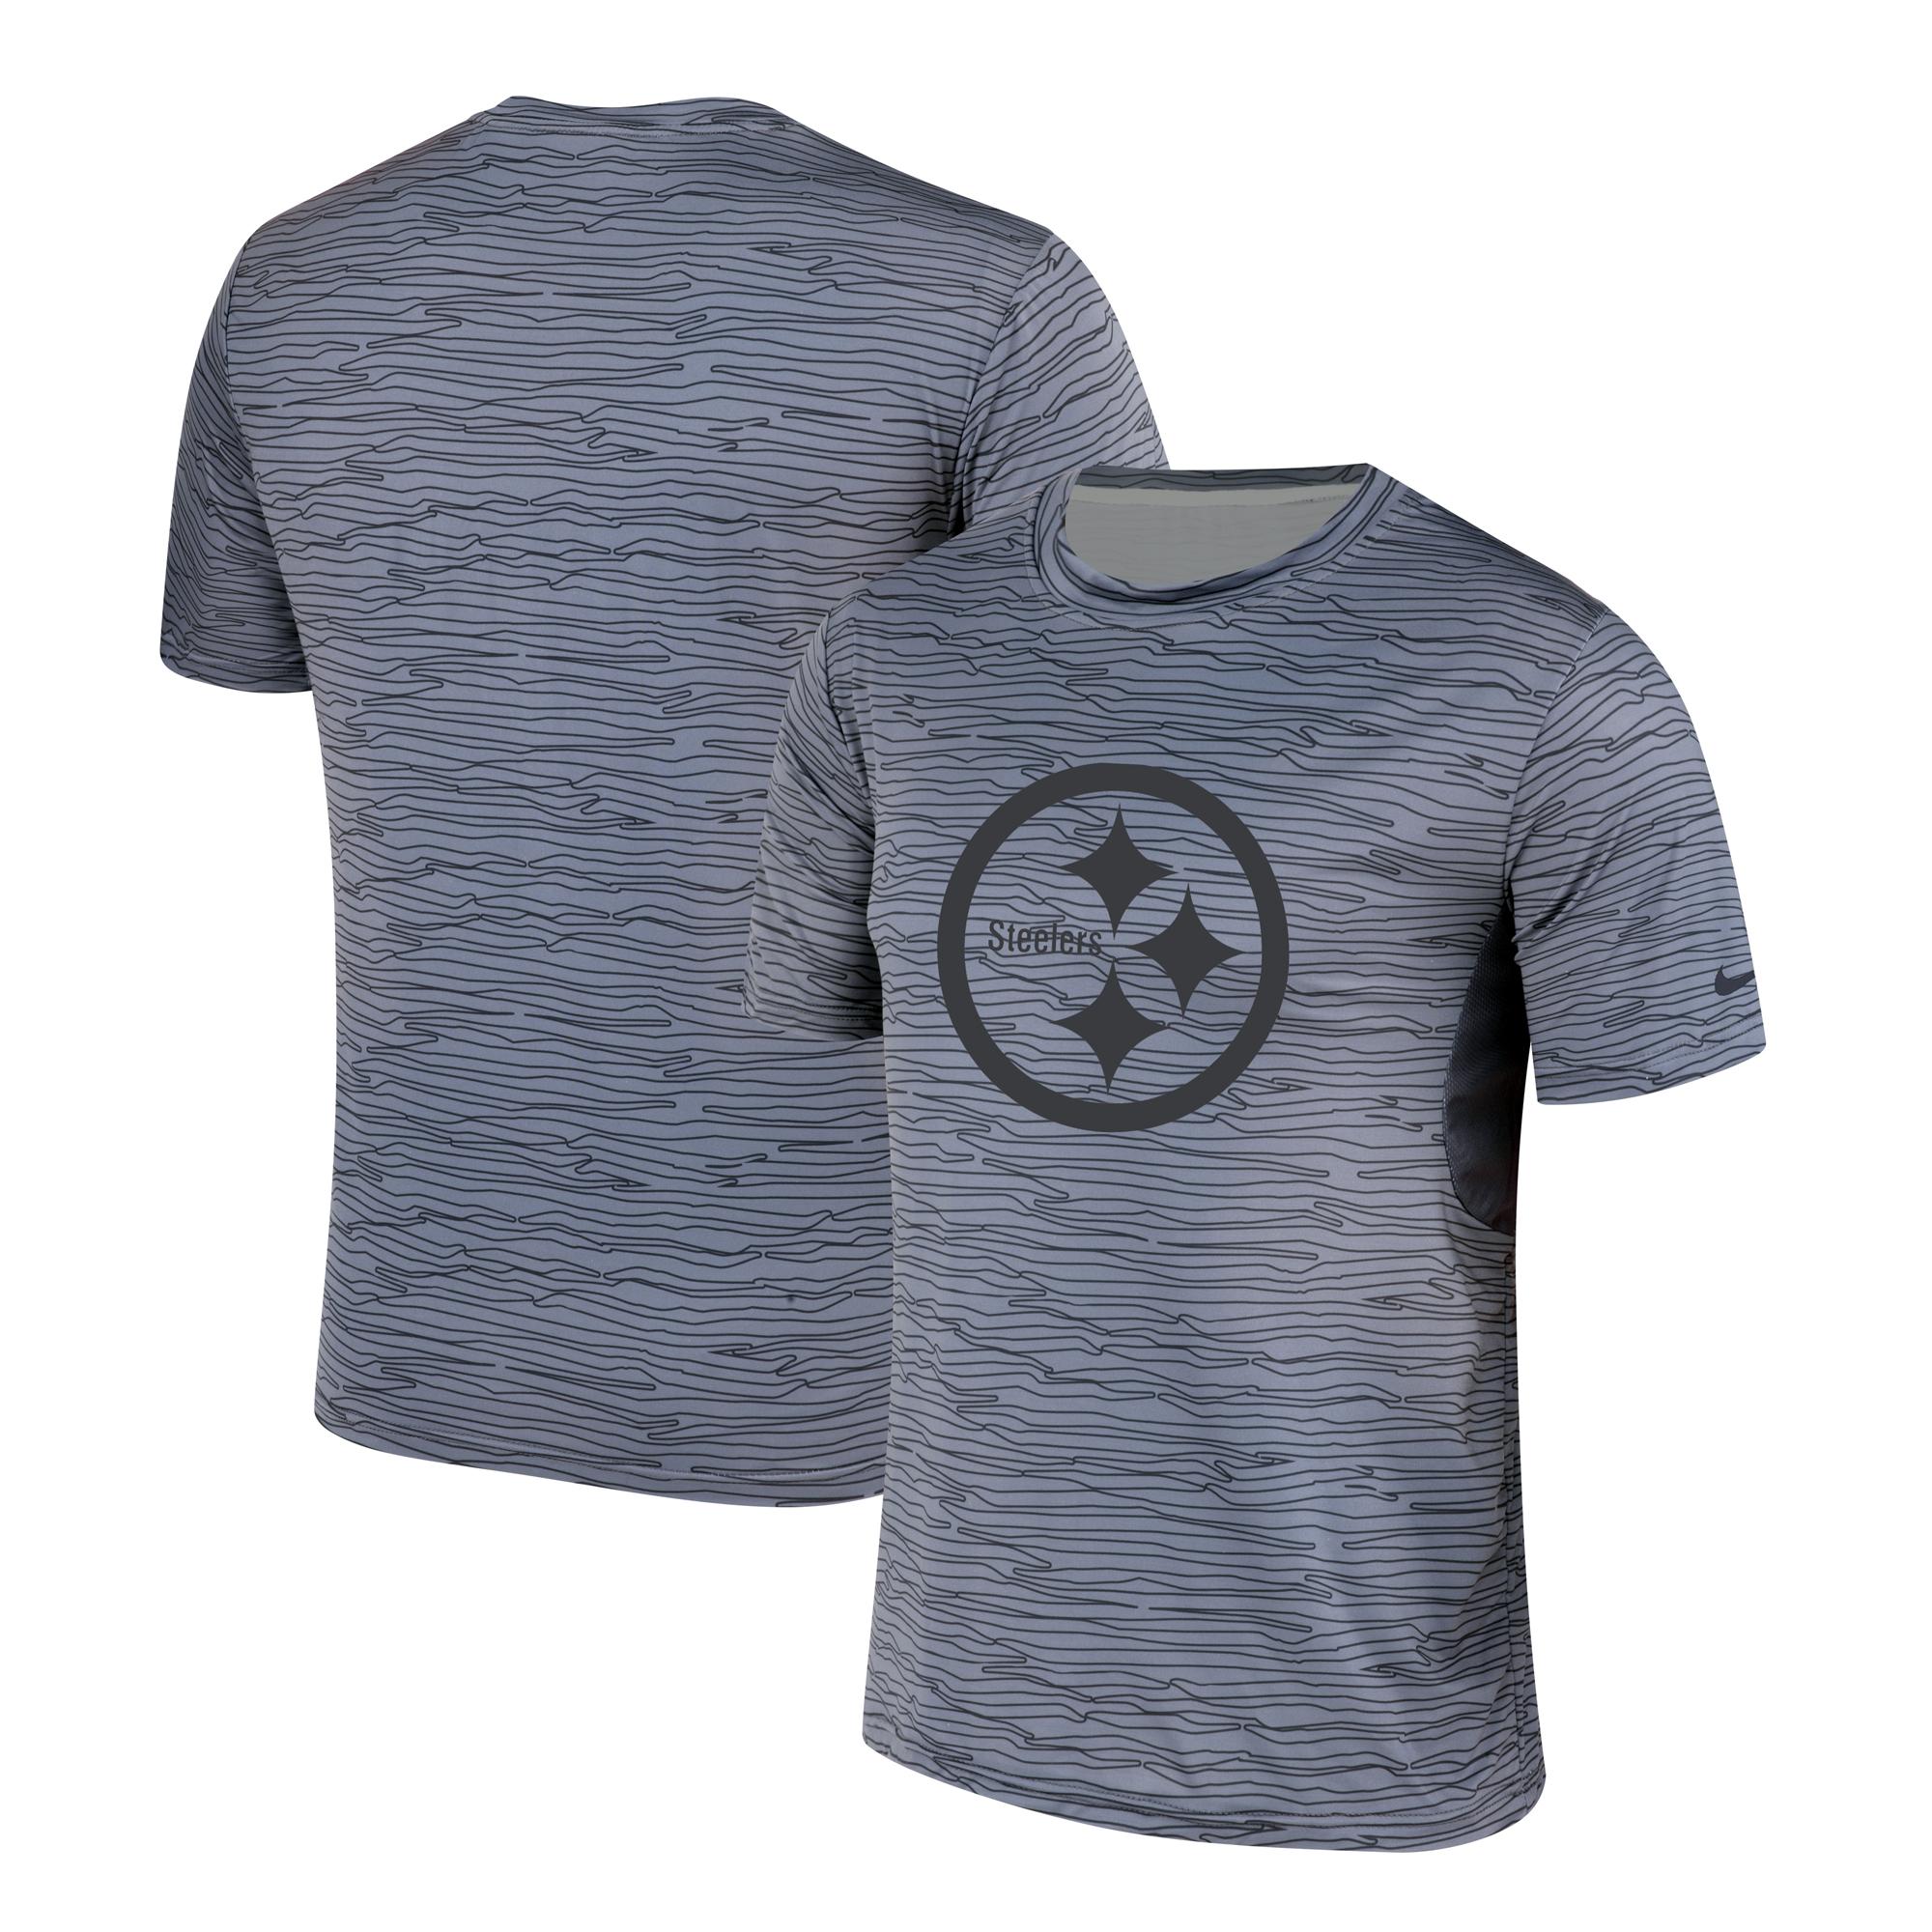 Men's Pittsburgh Steelers Nike Gray Black Striped Logo Performance T-Shirt